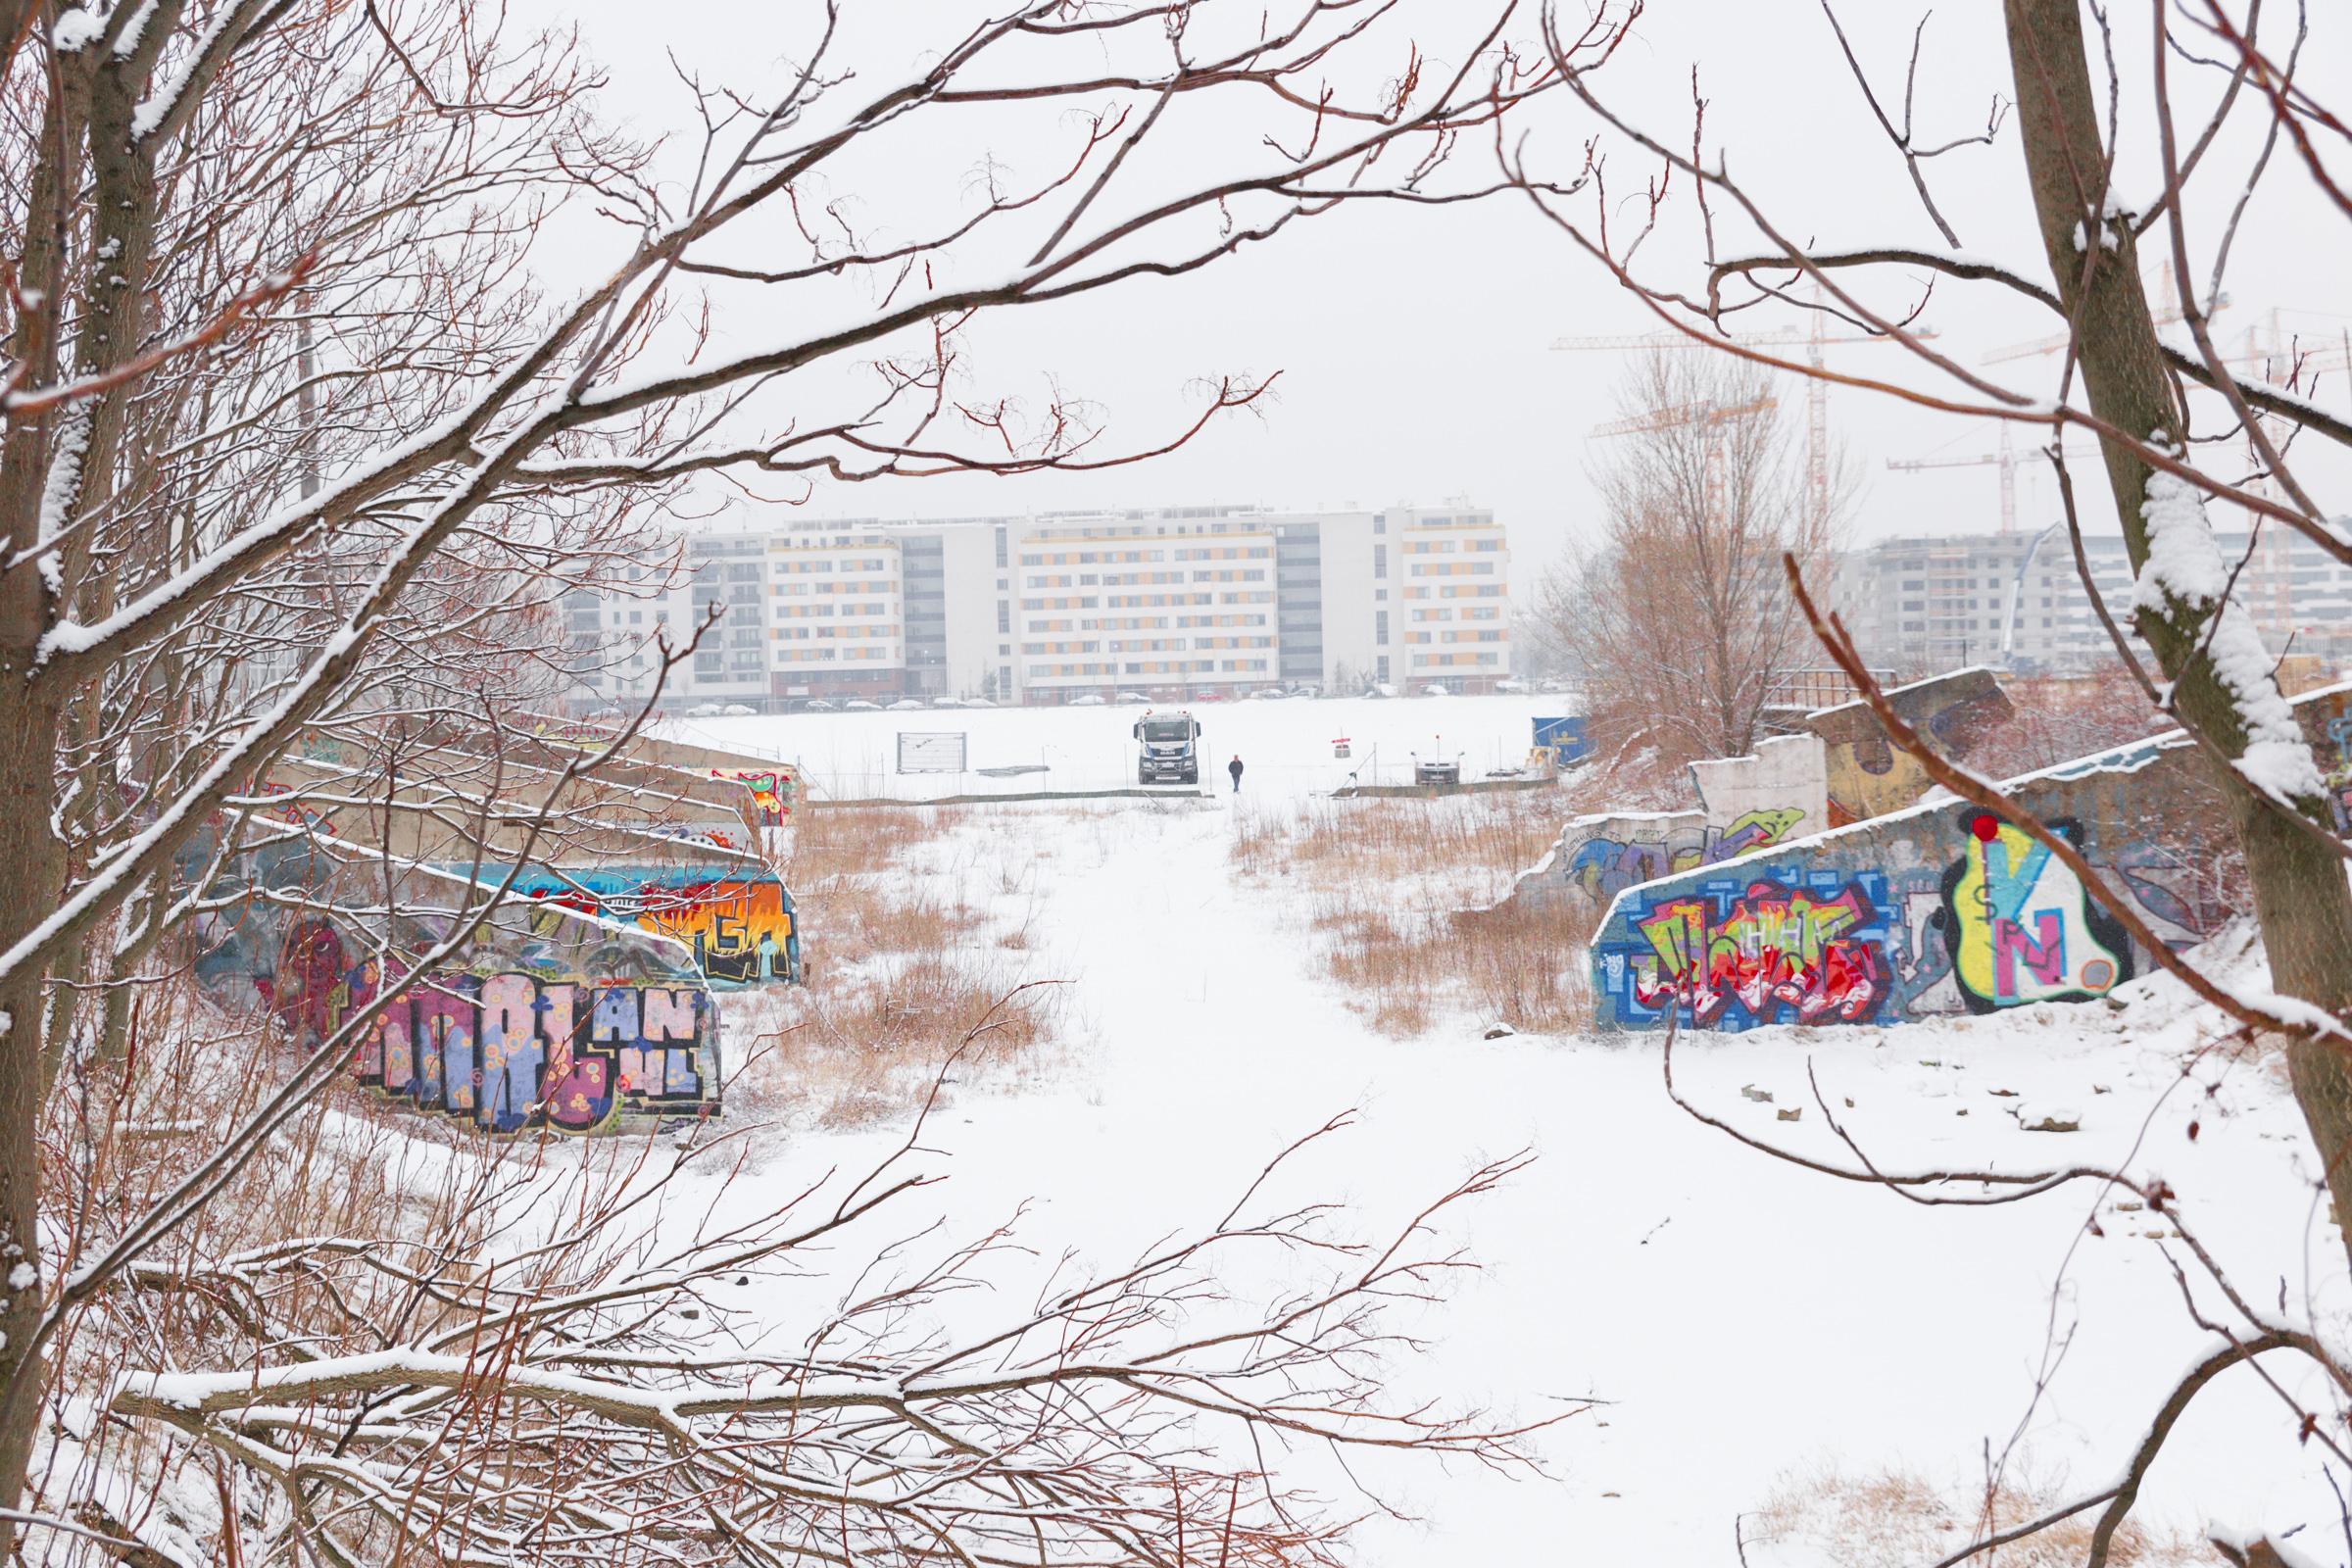 Winter am Wiener Nordbahnhof 1